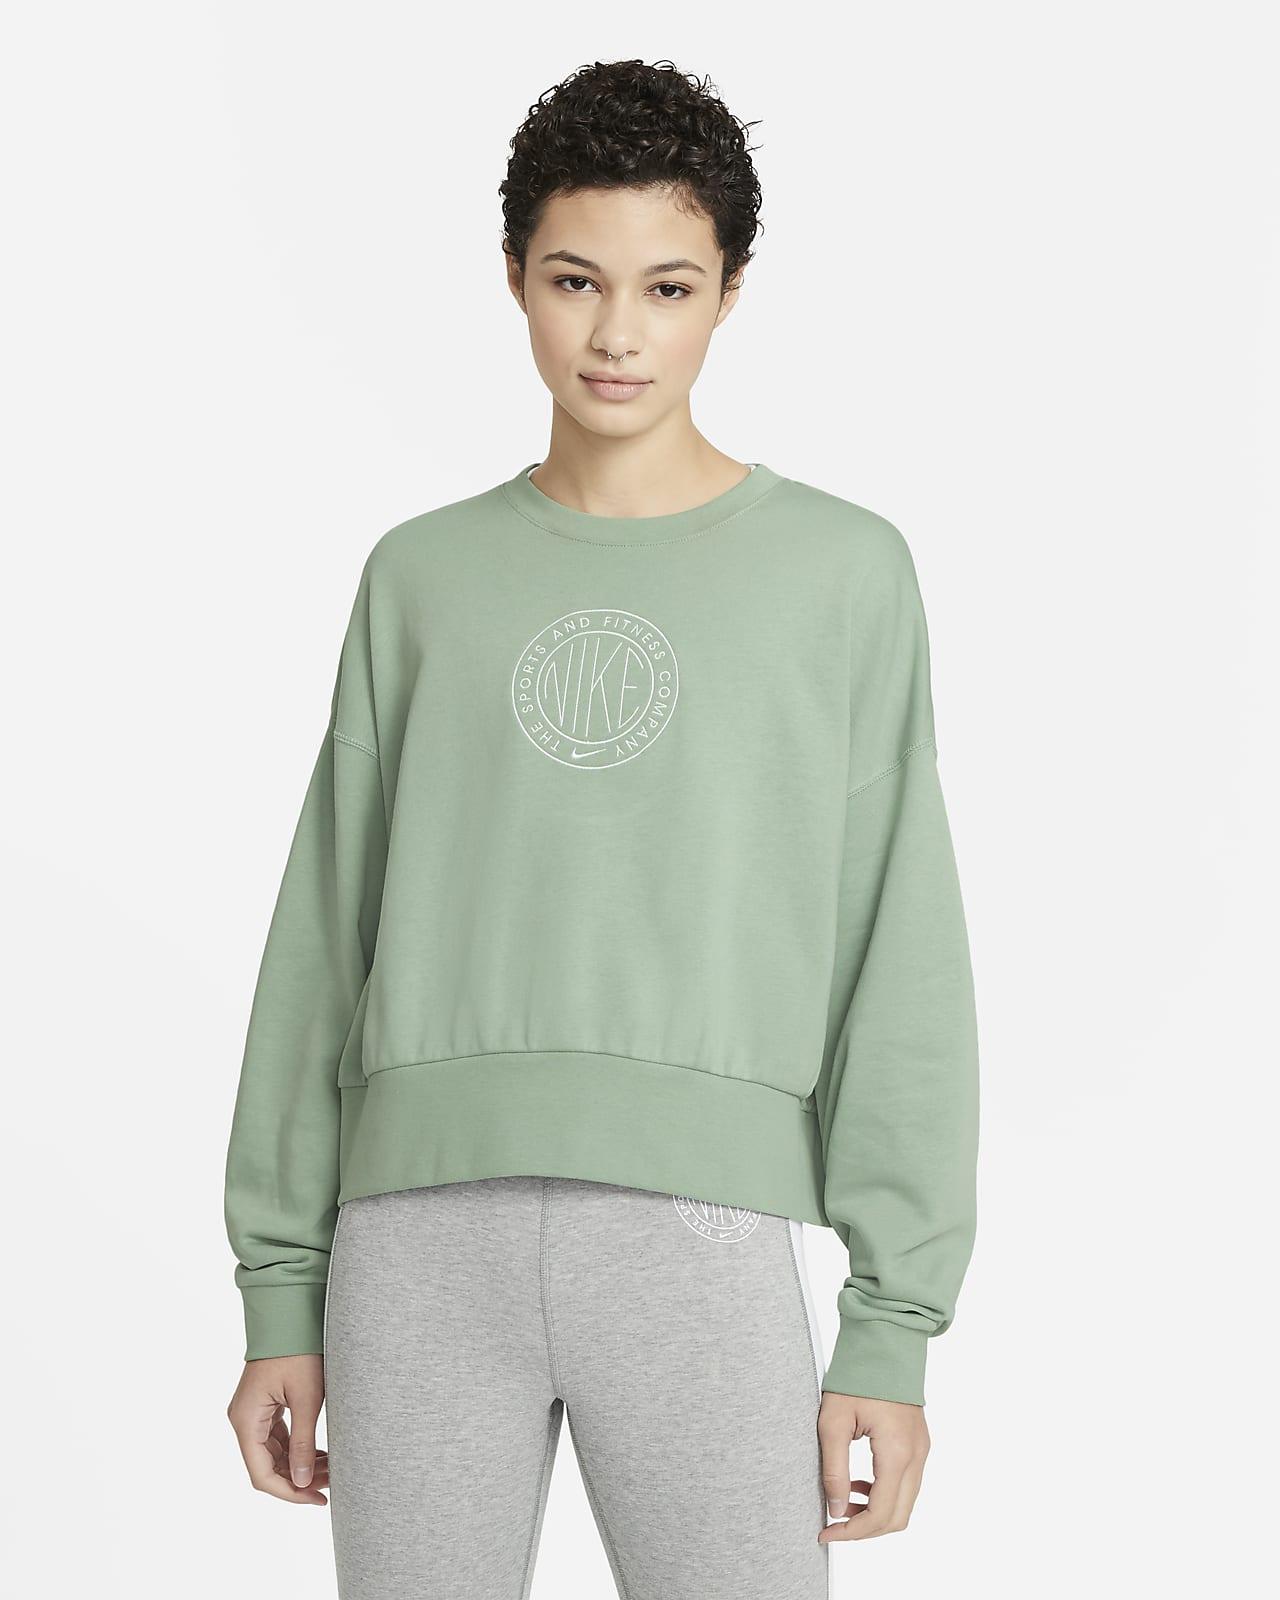 Maglia a girocollo Nike Sportswear Femme - Donna